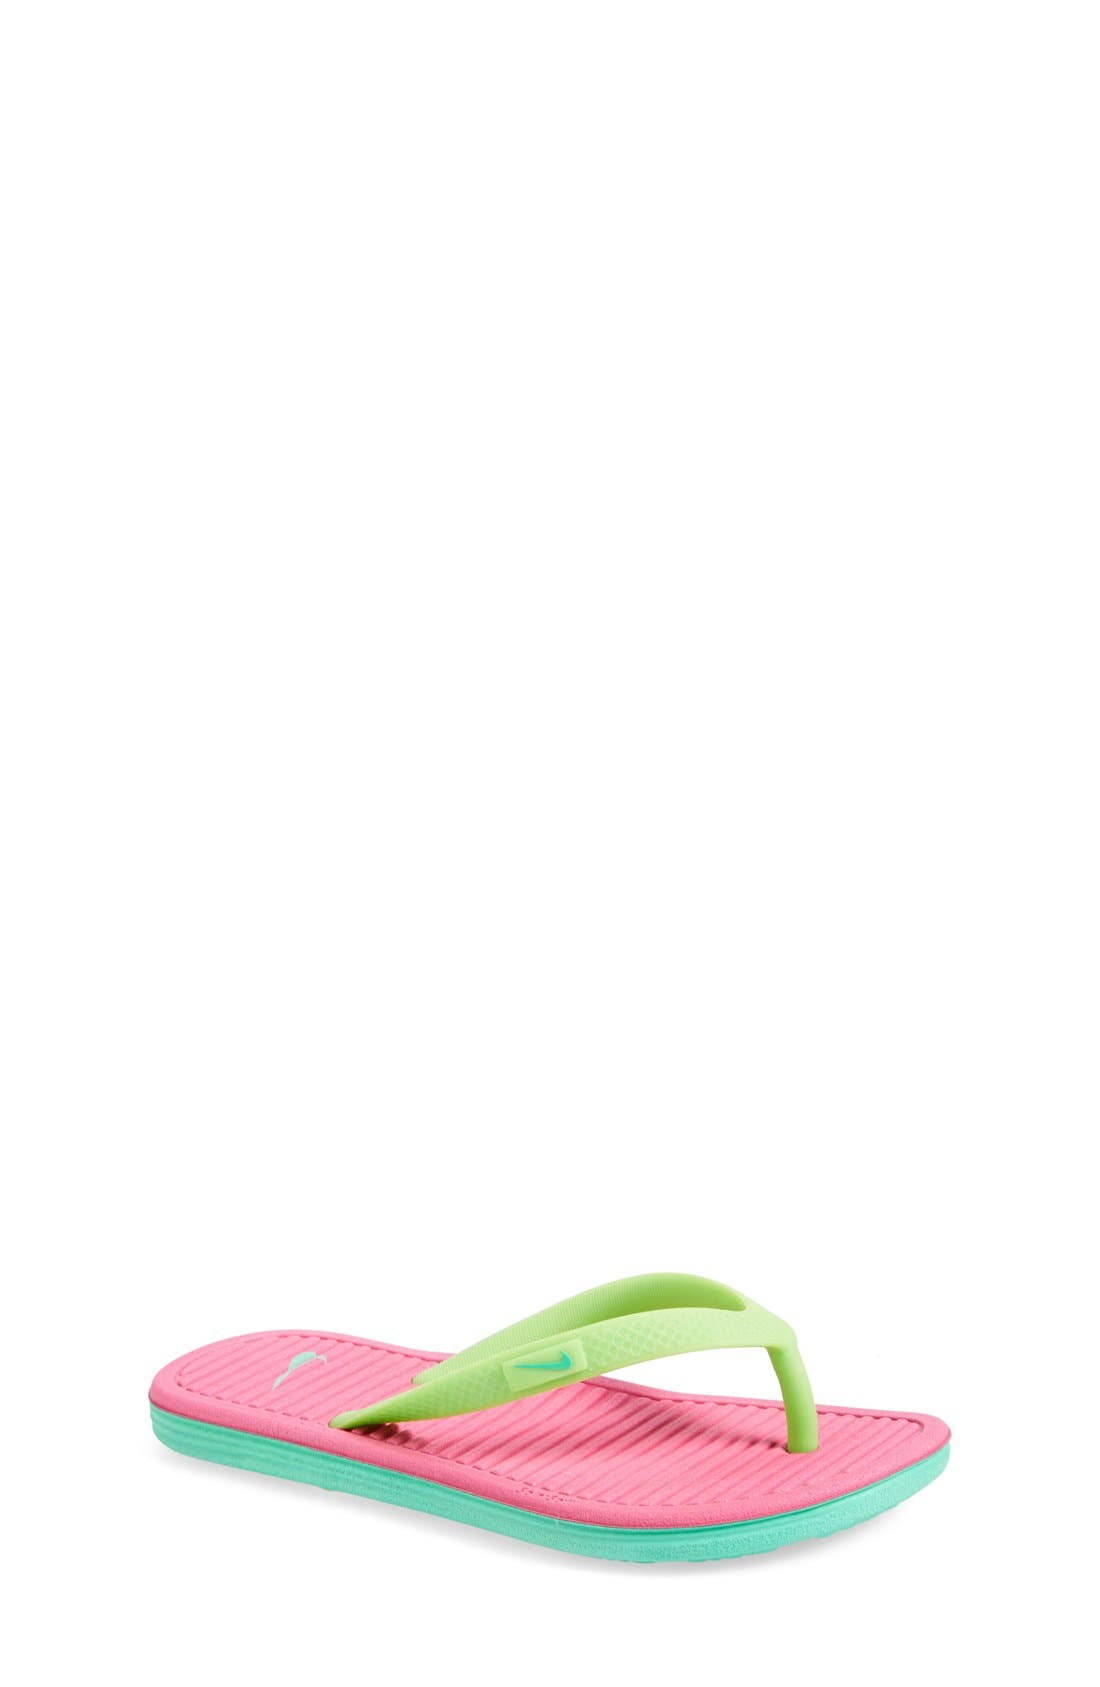 Alternate Image 1 Selected - Nike 'SolarSoft 2' Sandal (Toddler, Little Kid & Big Kid)